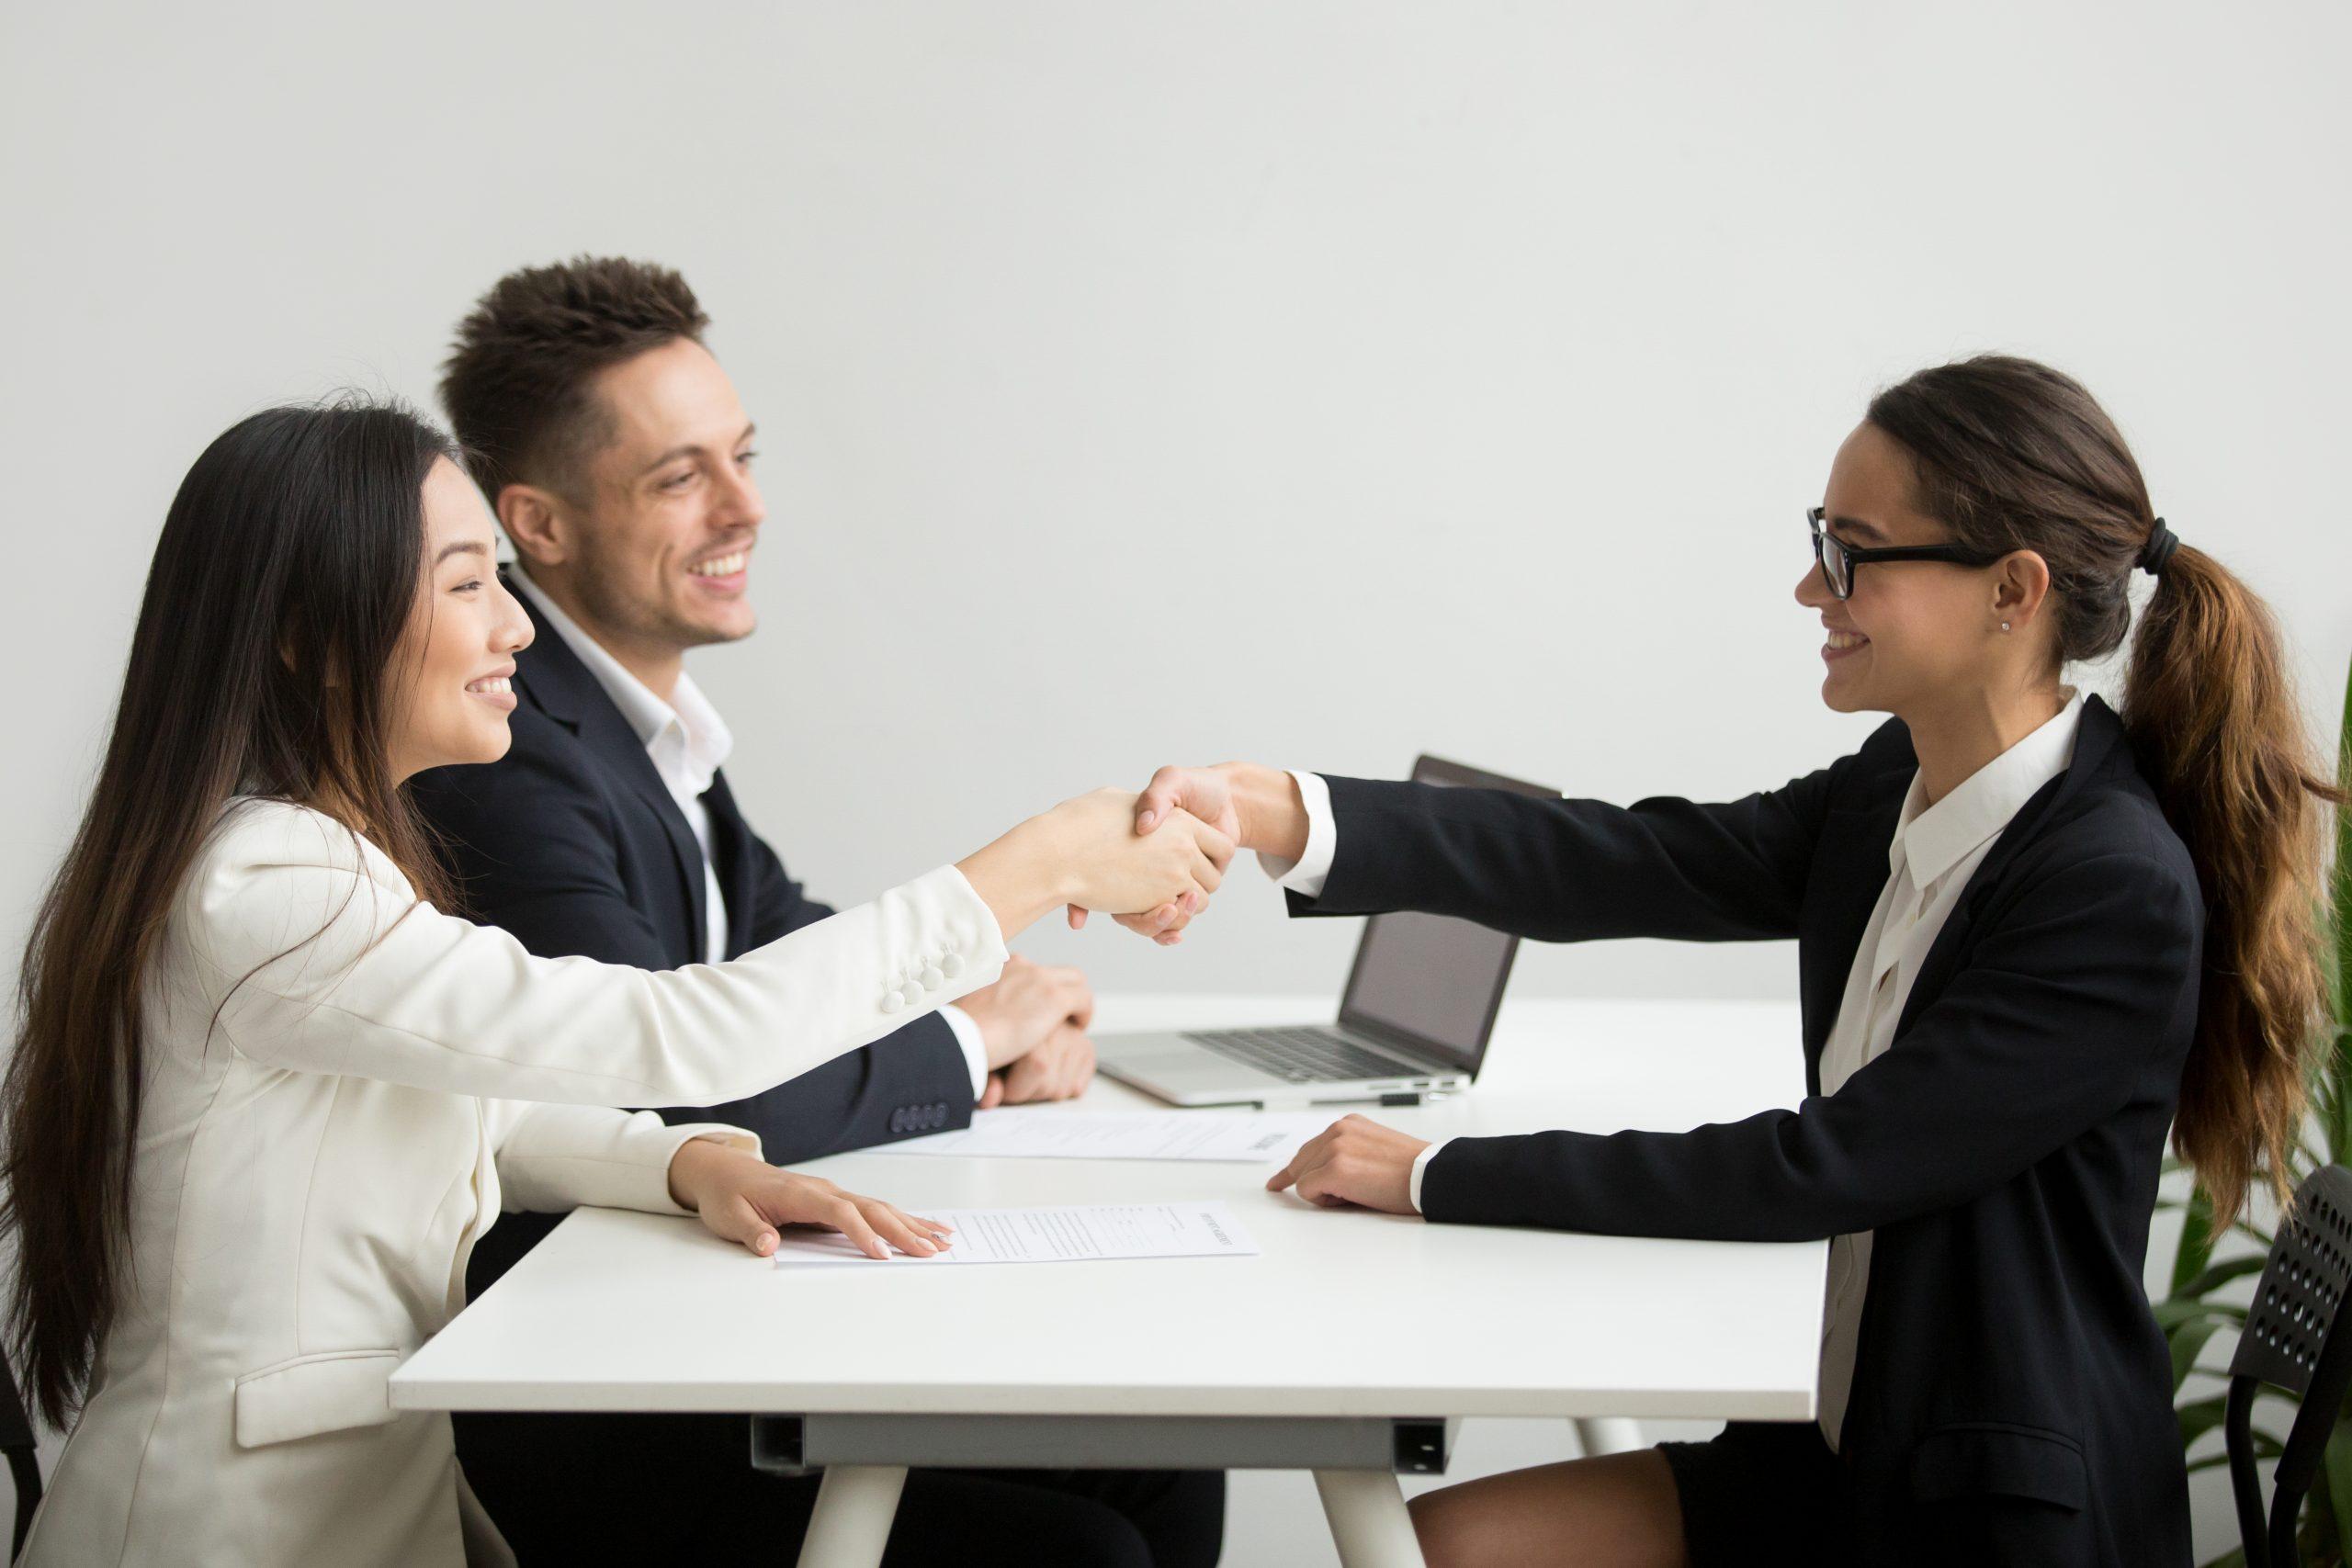 Hiring more diverse candidates